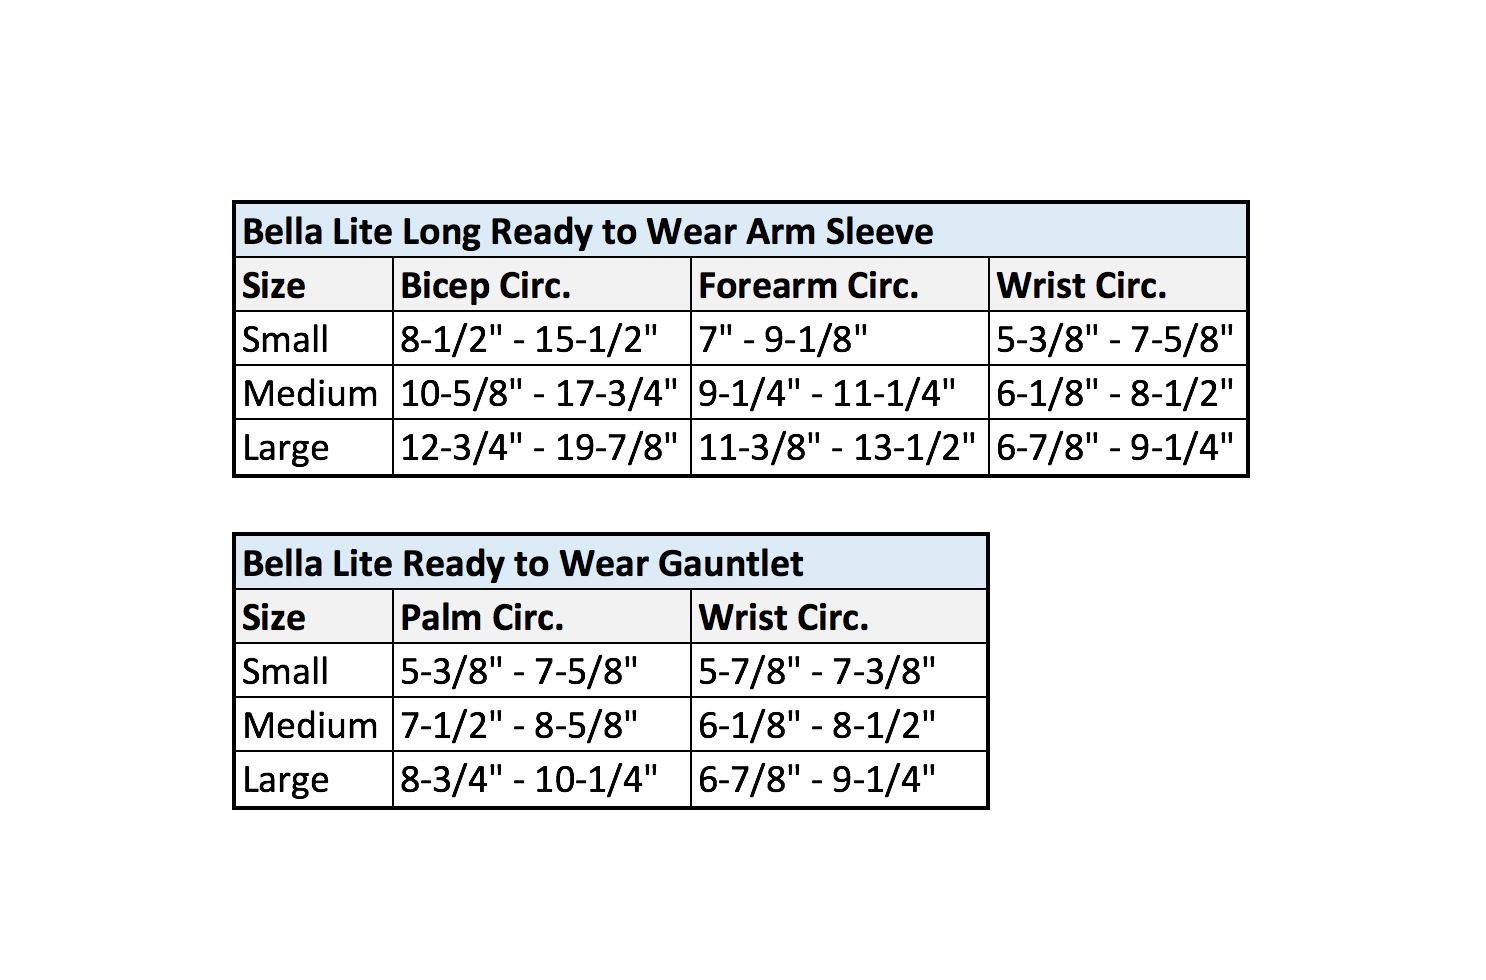 Bella Lite Long Ready-to-Wear Arm Sleeve Size Chart